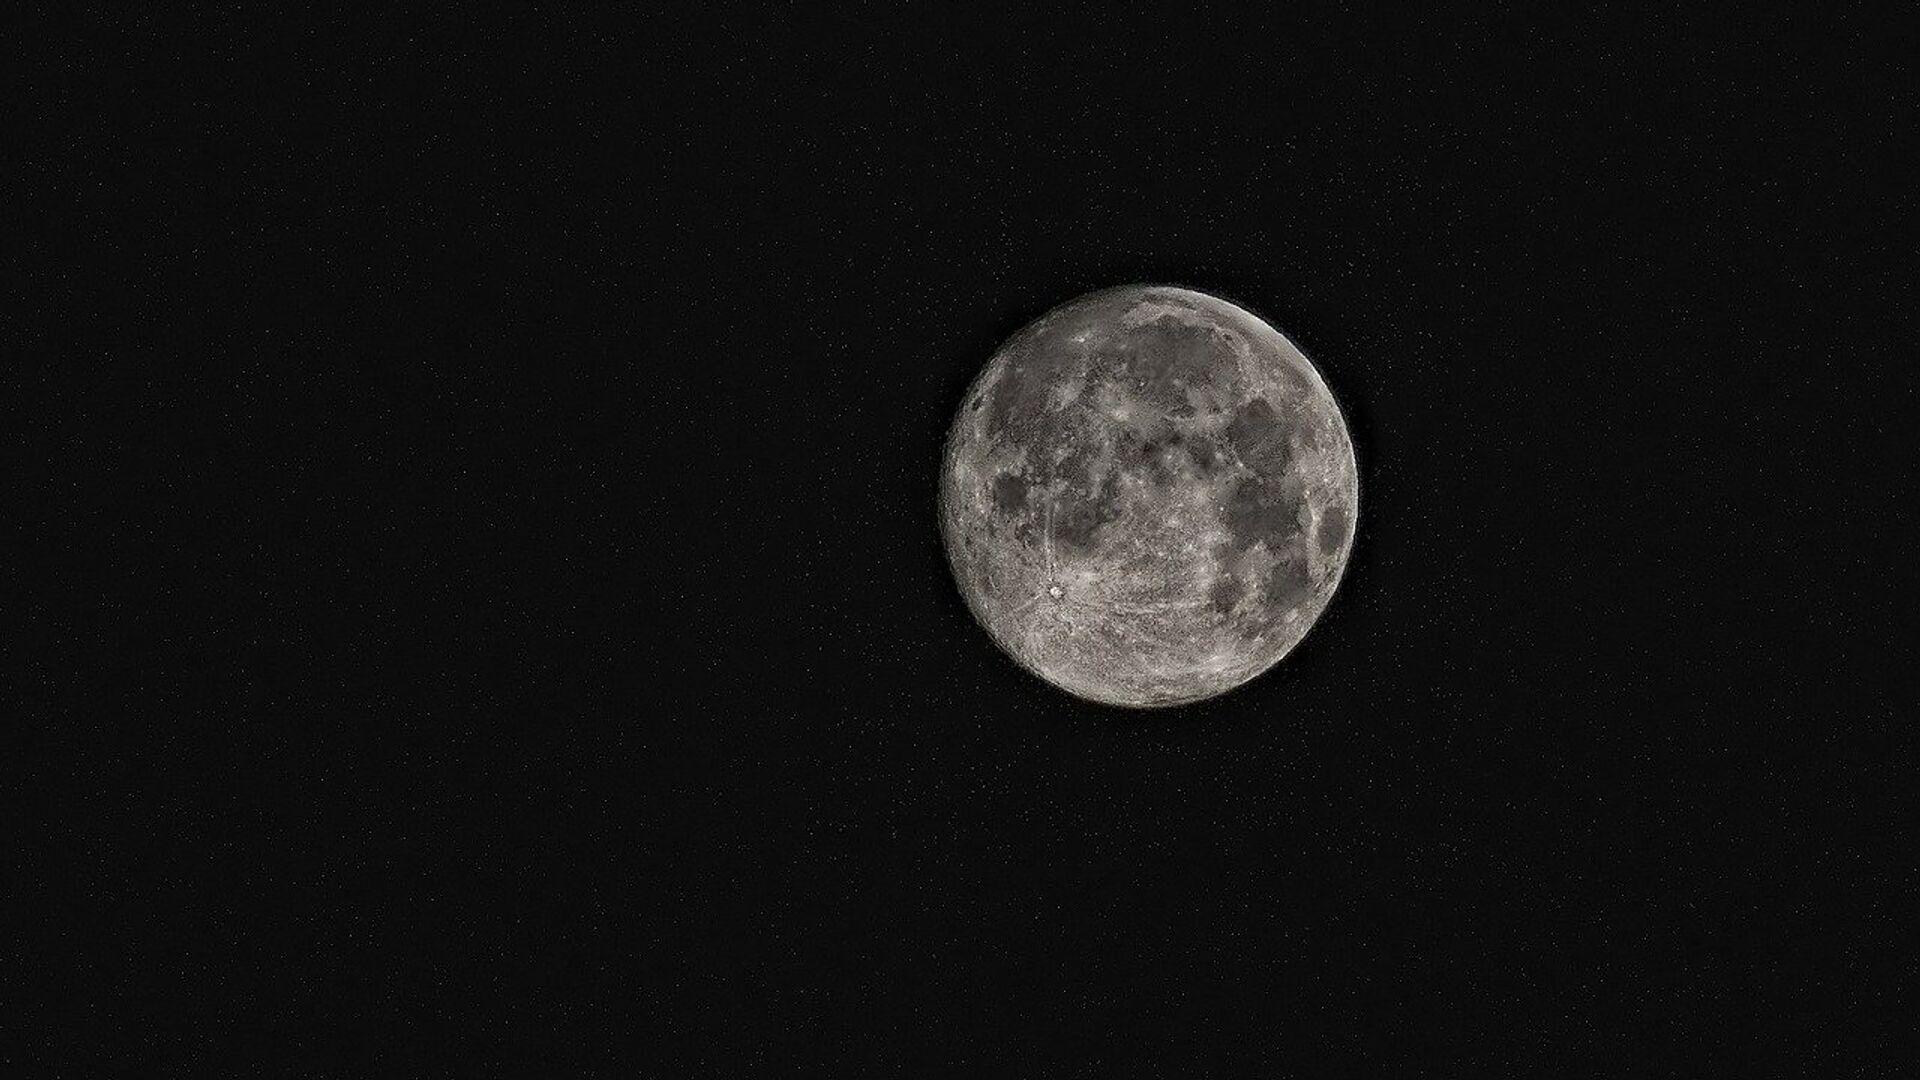 La Luna (imagen referencial) - Sputnik Mundo, 1920, 17.03.2021